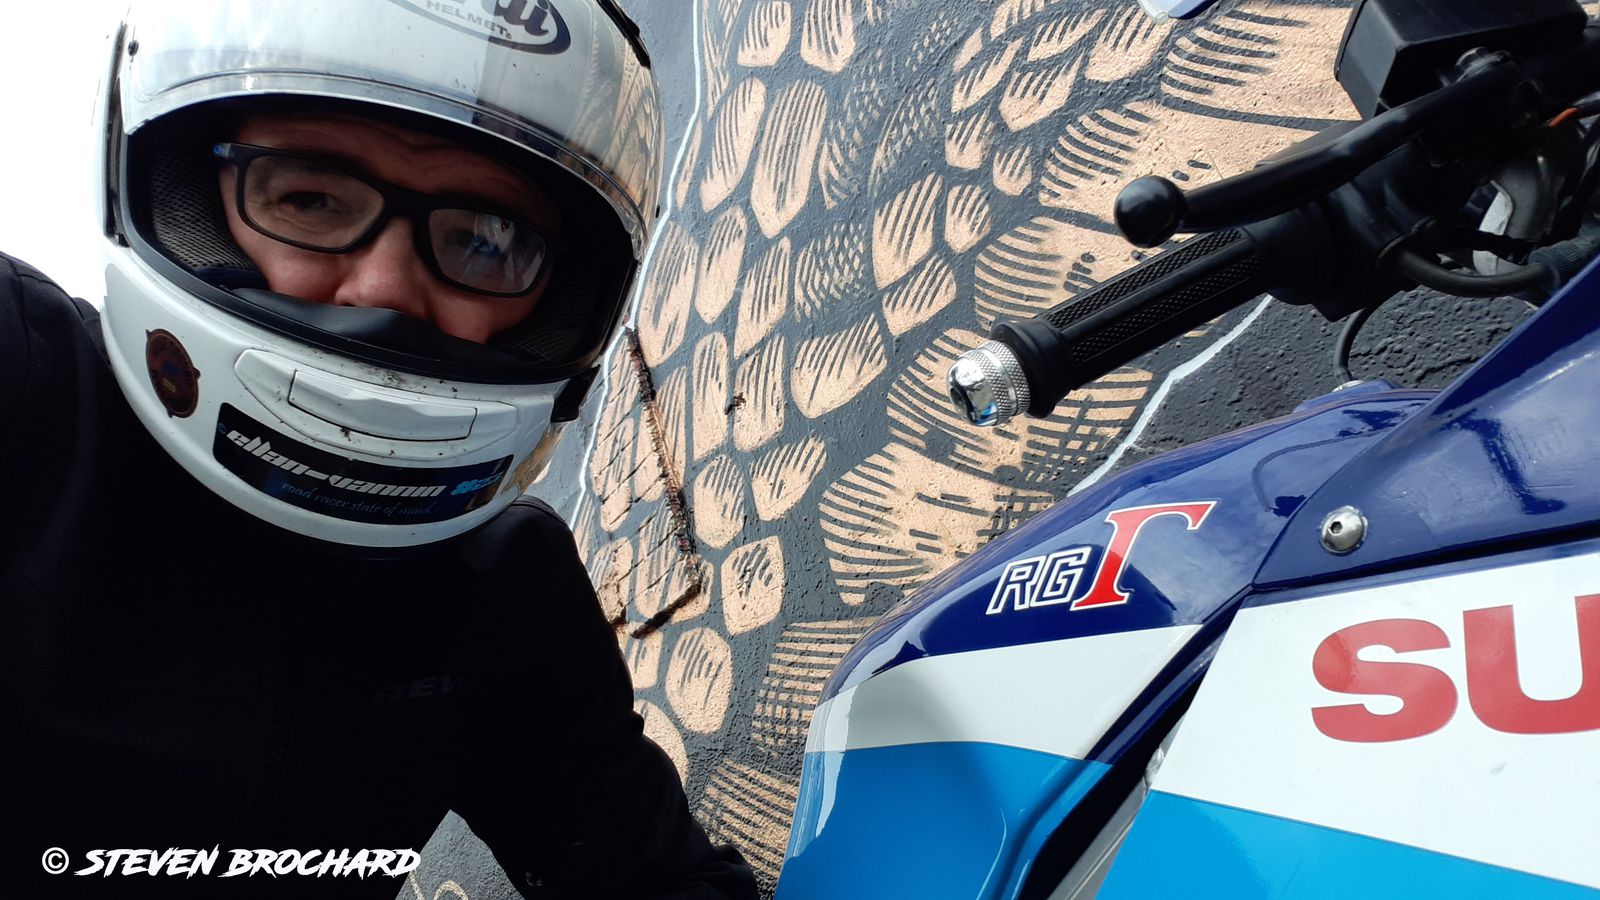 Classic Superbike #4